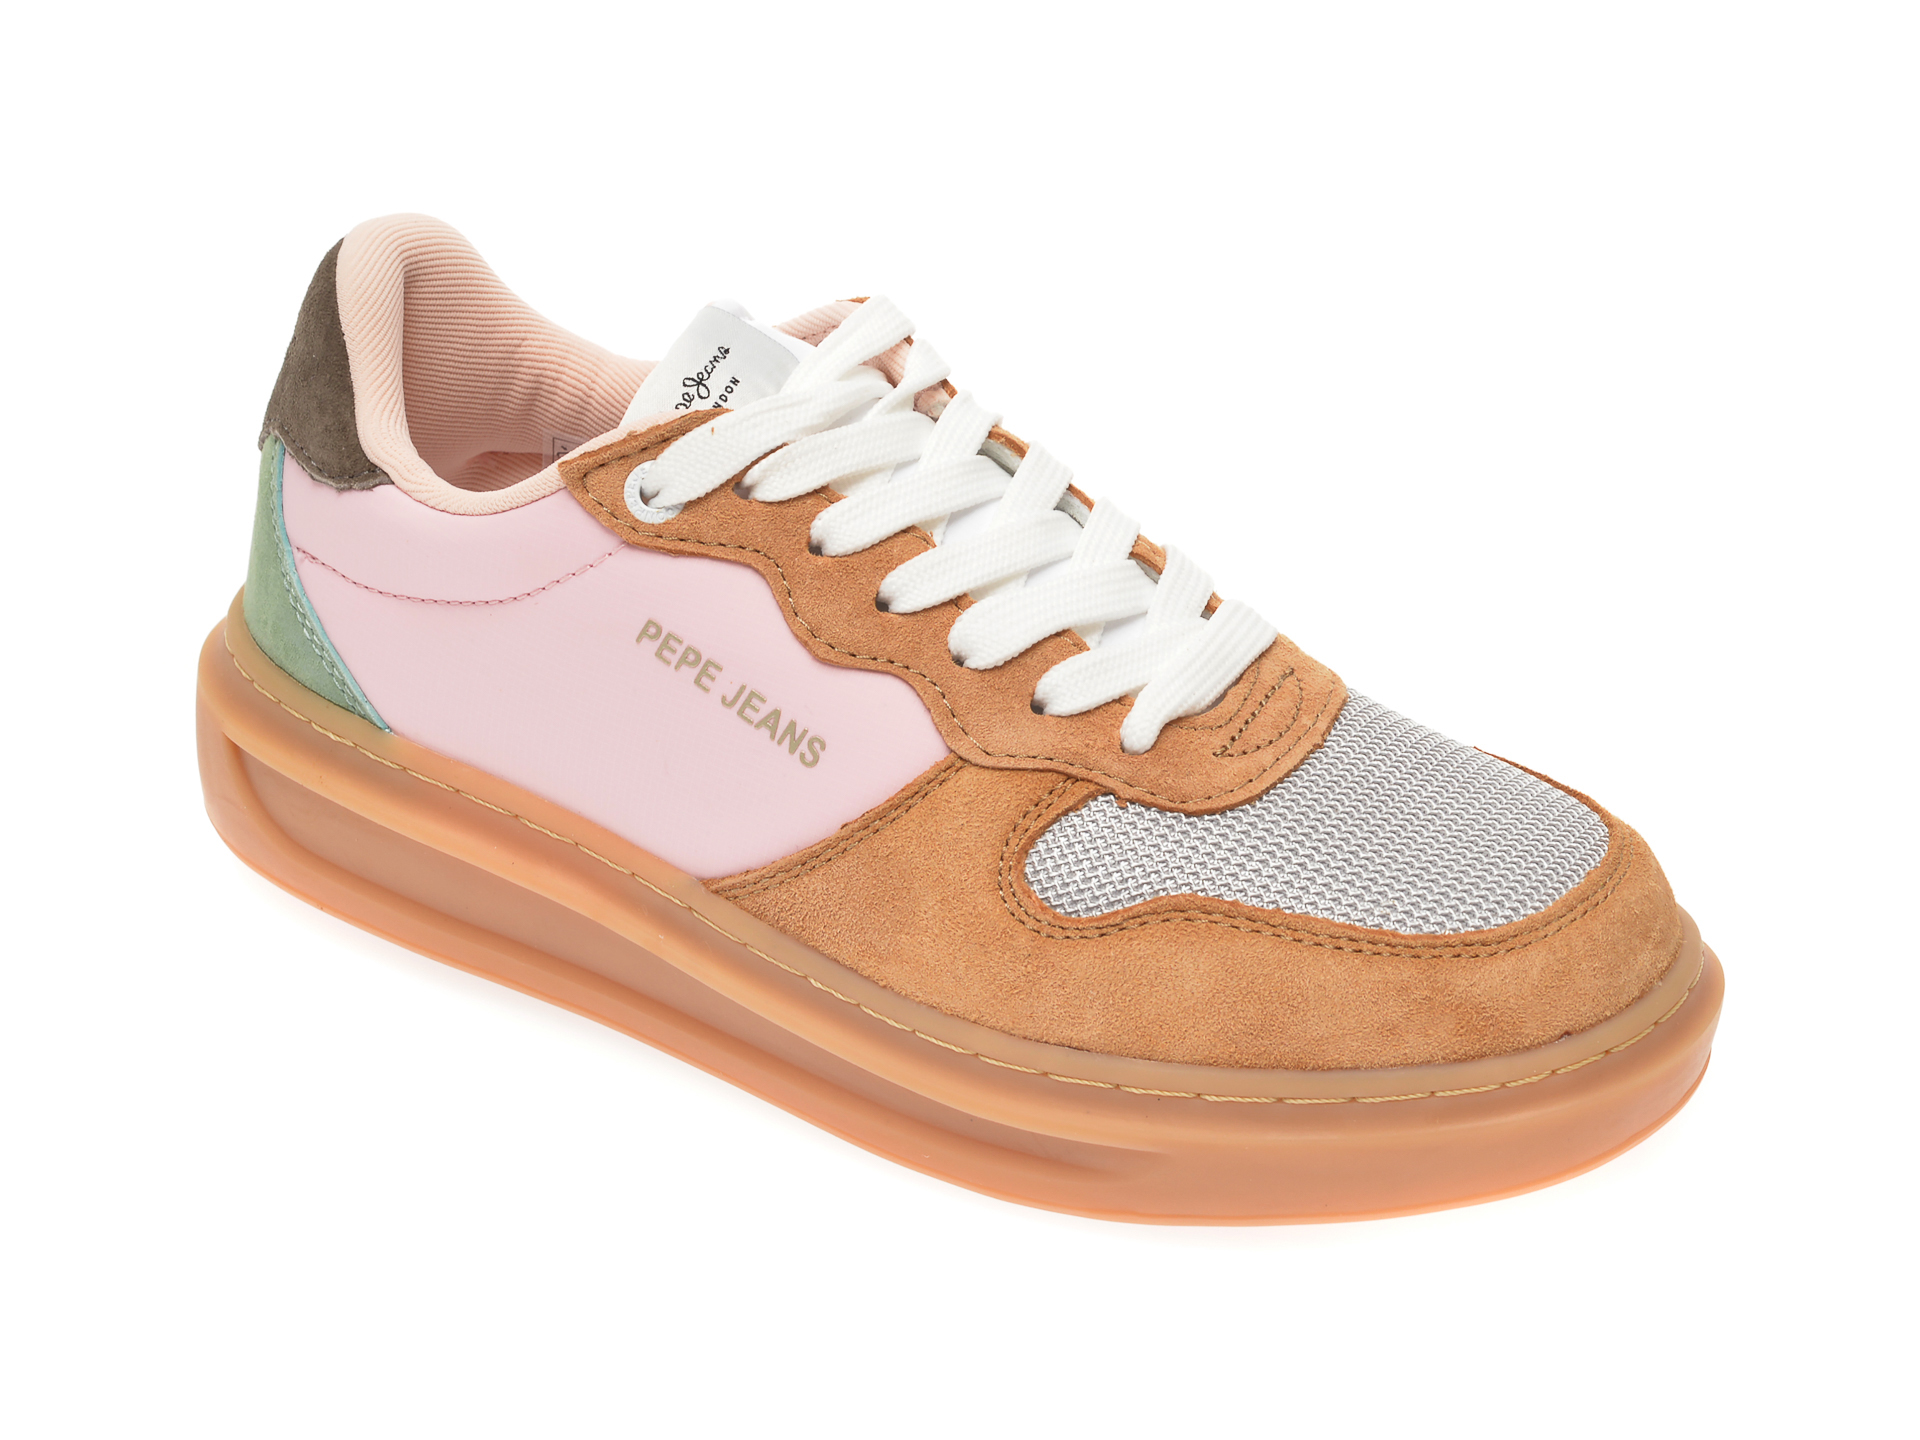 Pantofi sport PEPE JEANS maro LS30962, din material textil si piele intoarsa